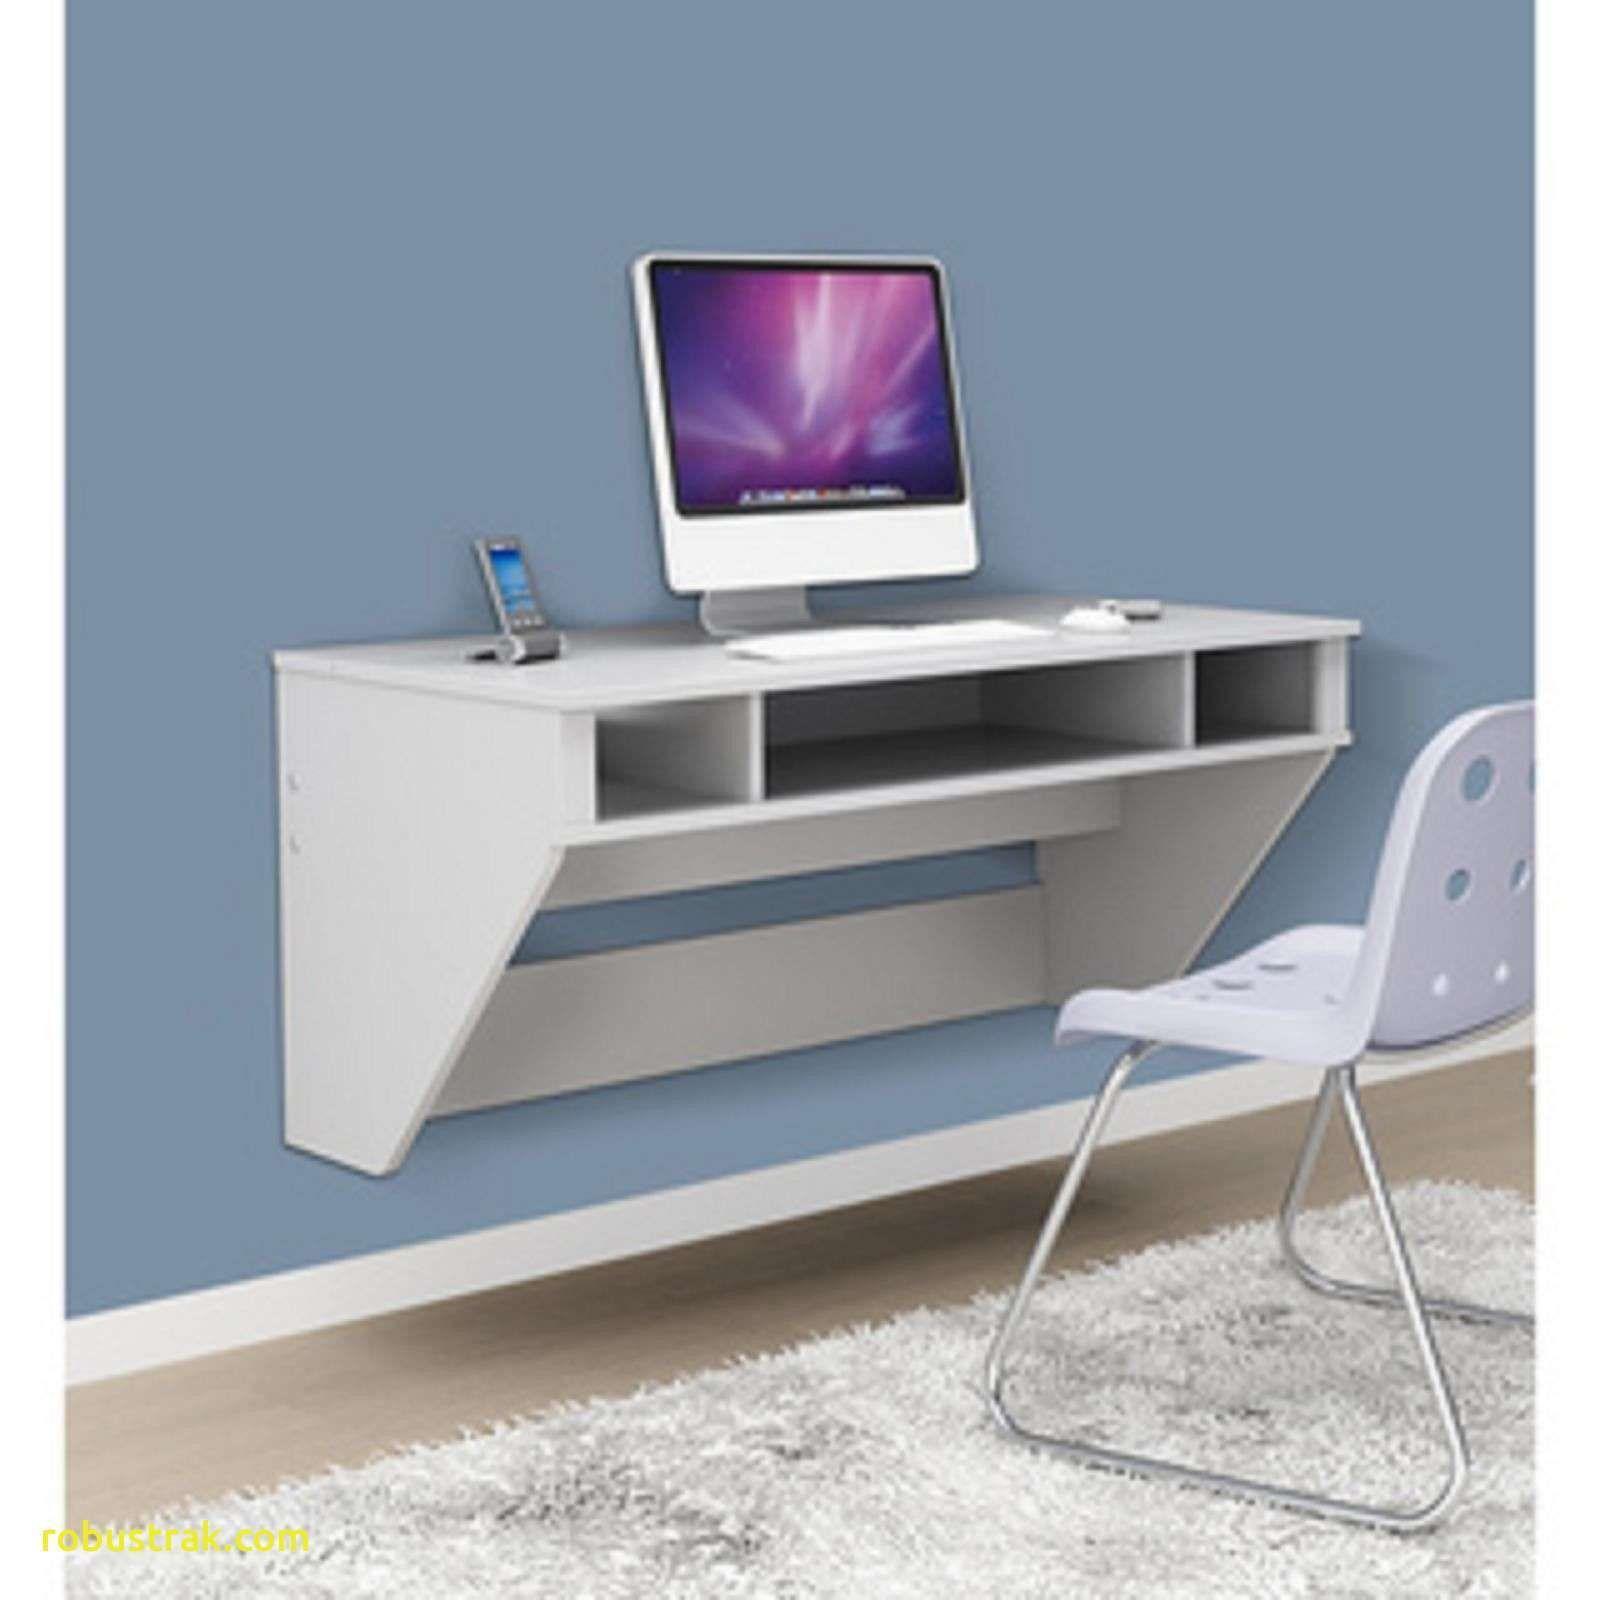 Acrylic Computer Desk White Floating Desk Floating Wall Desk